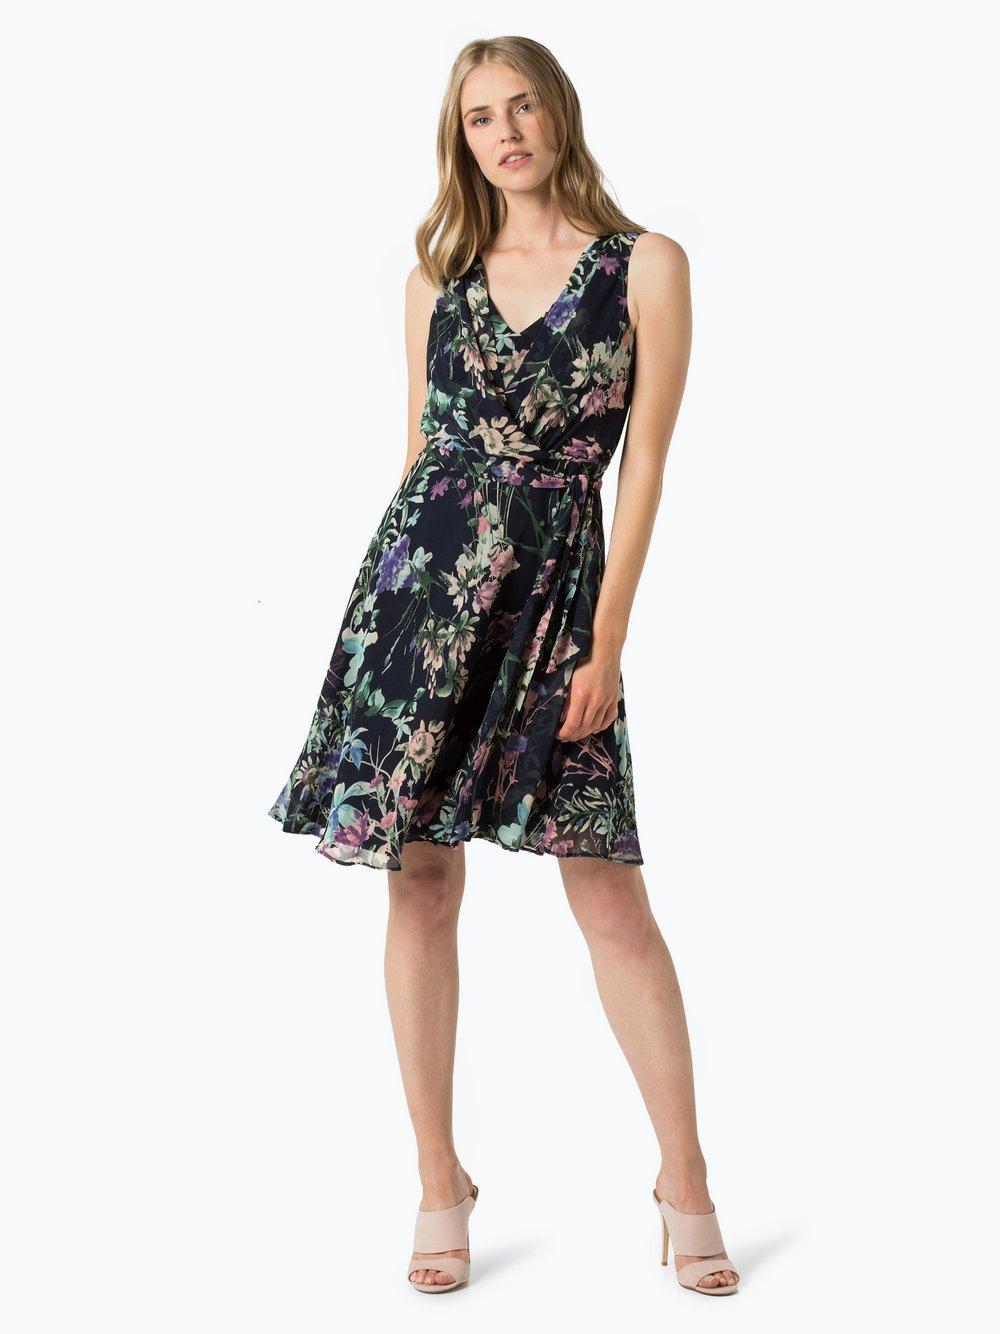 4a607e02c5a525 Esprit KaufenVangraaf Collection Damen Kleid Online com wZiOkuTPXl